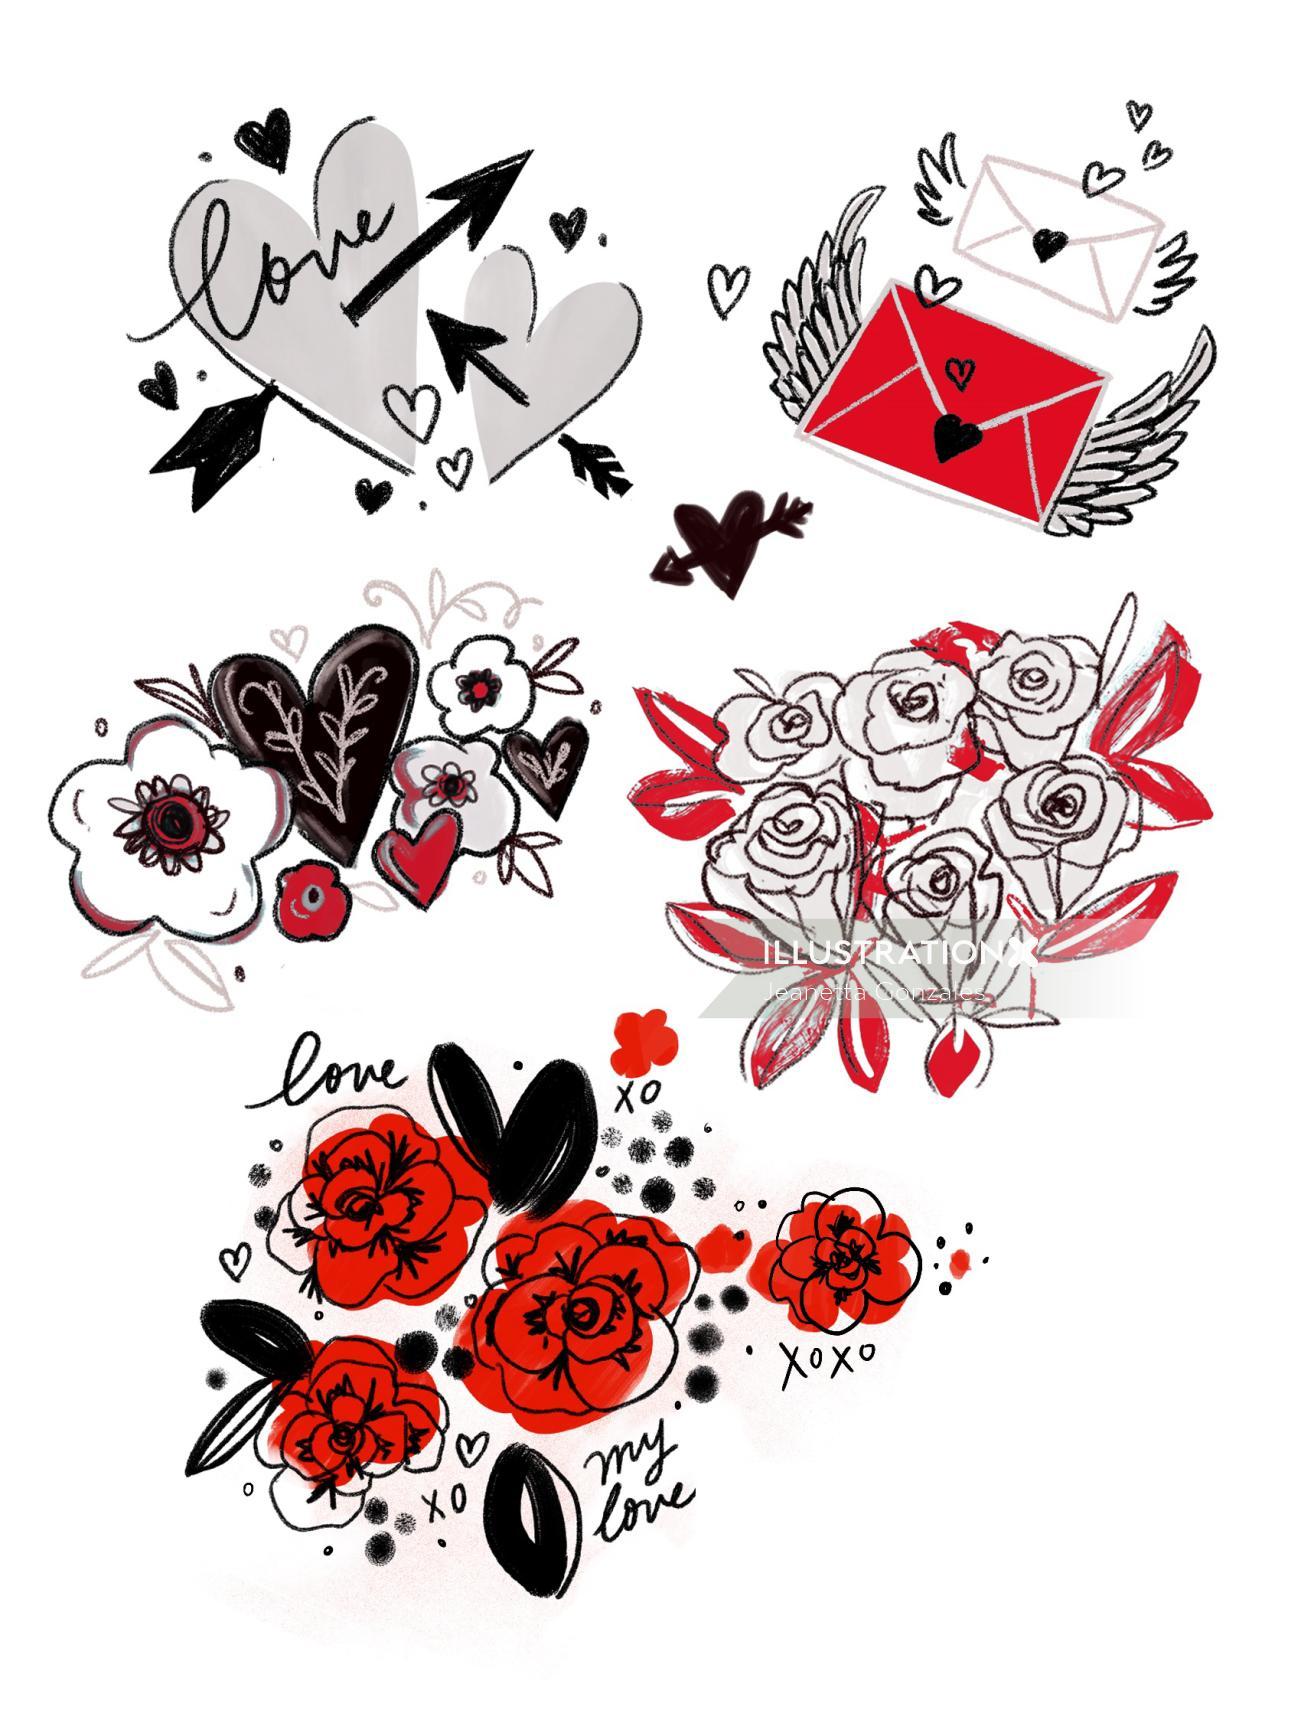 Decorative illustration of love